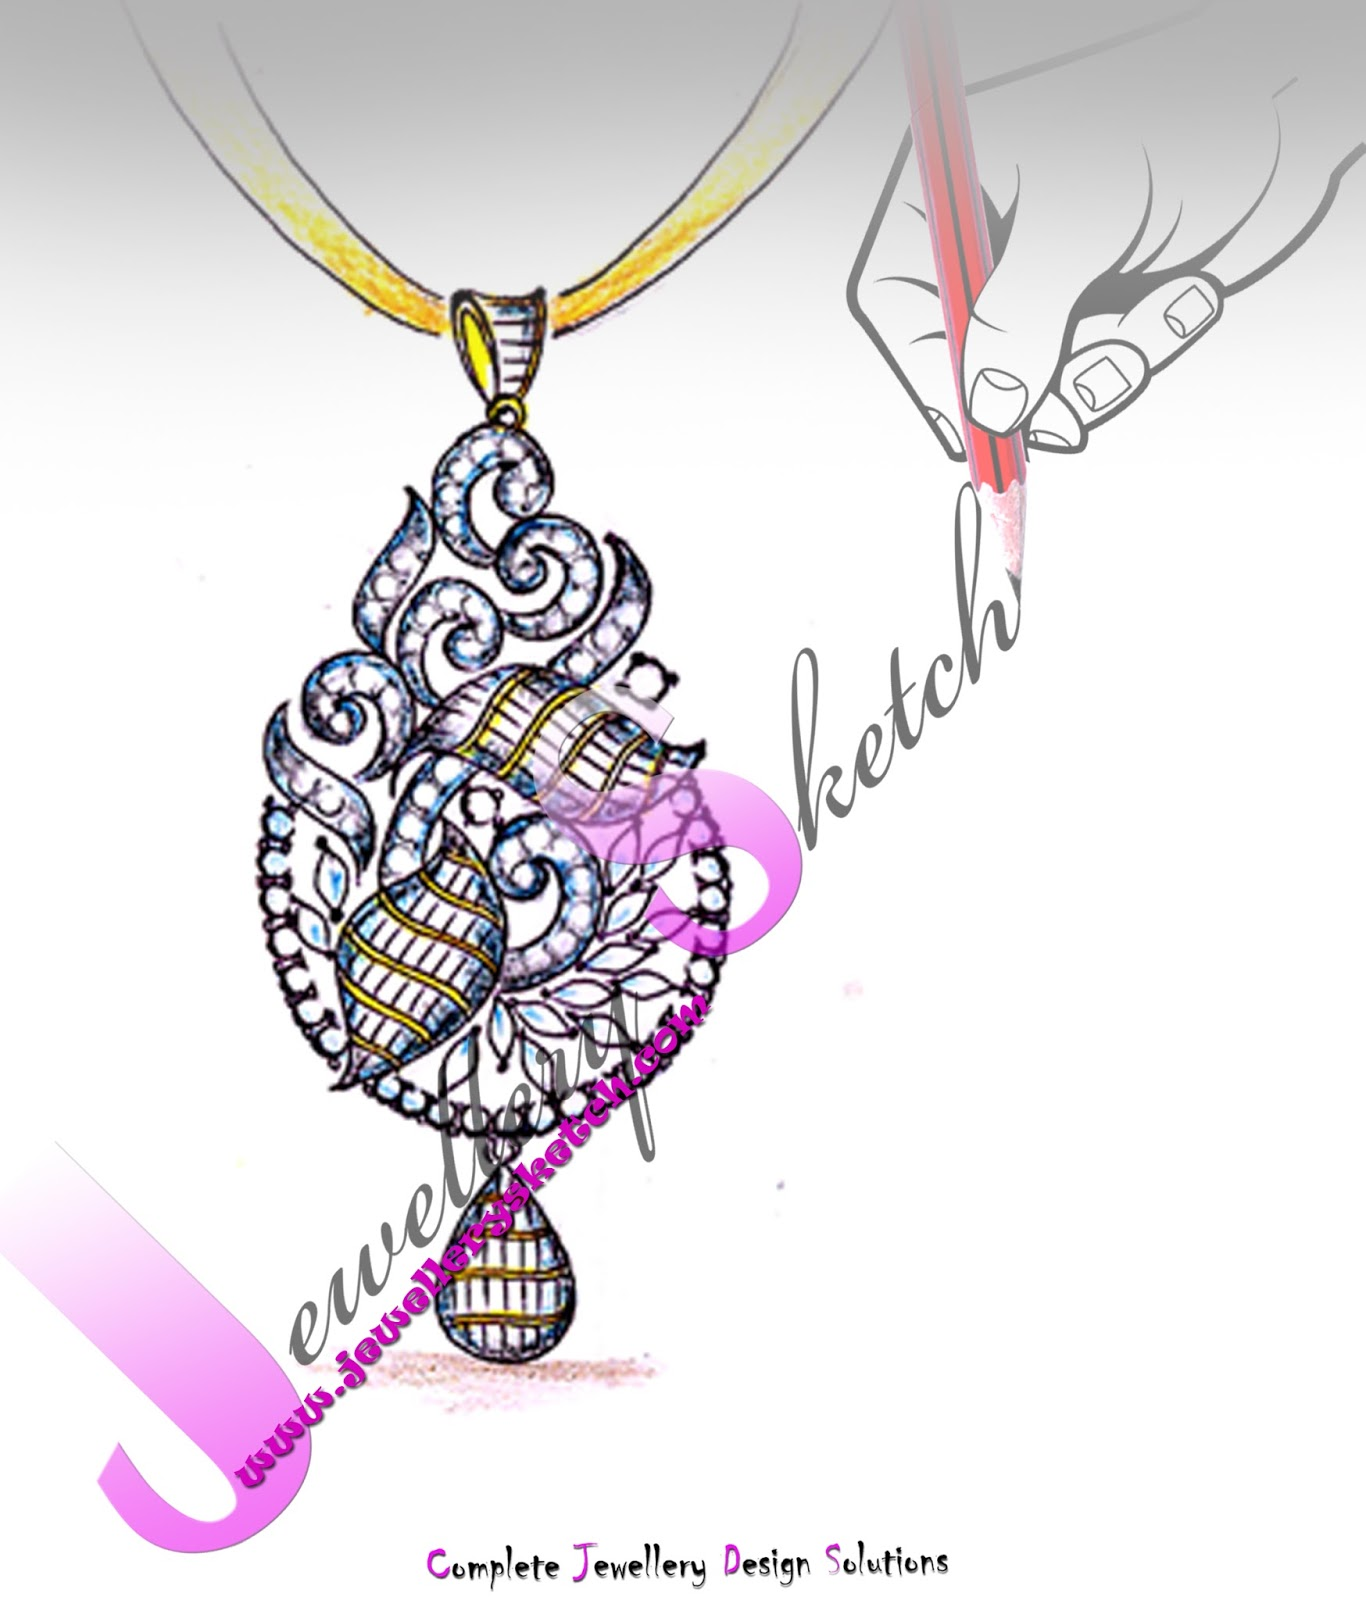 Drawn jewelry jewelry design : i jewellery January #trendyjewellerydesigns